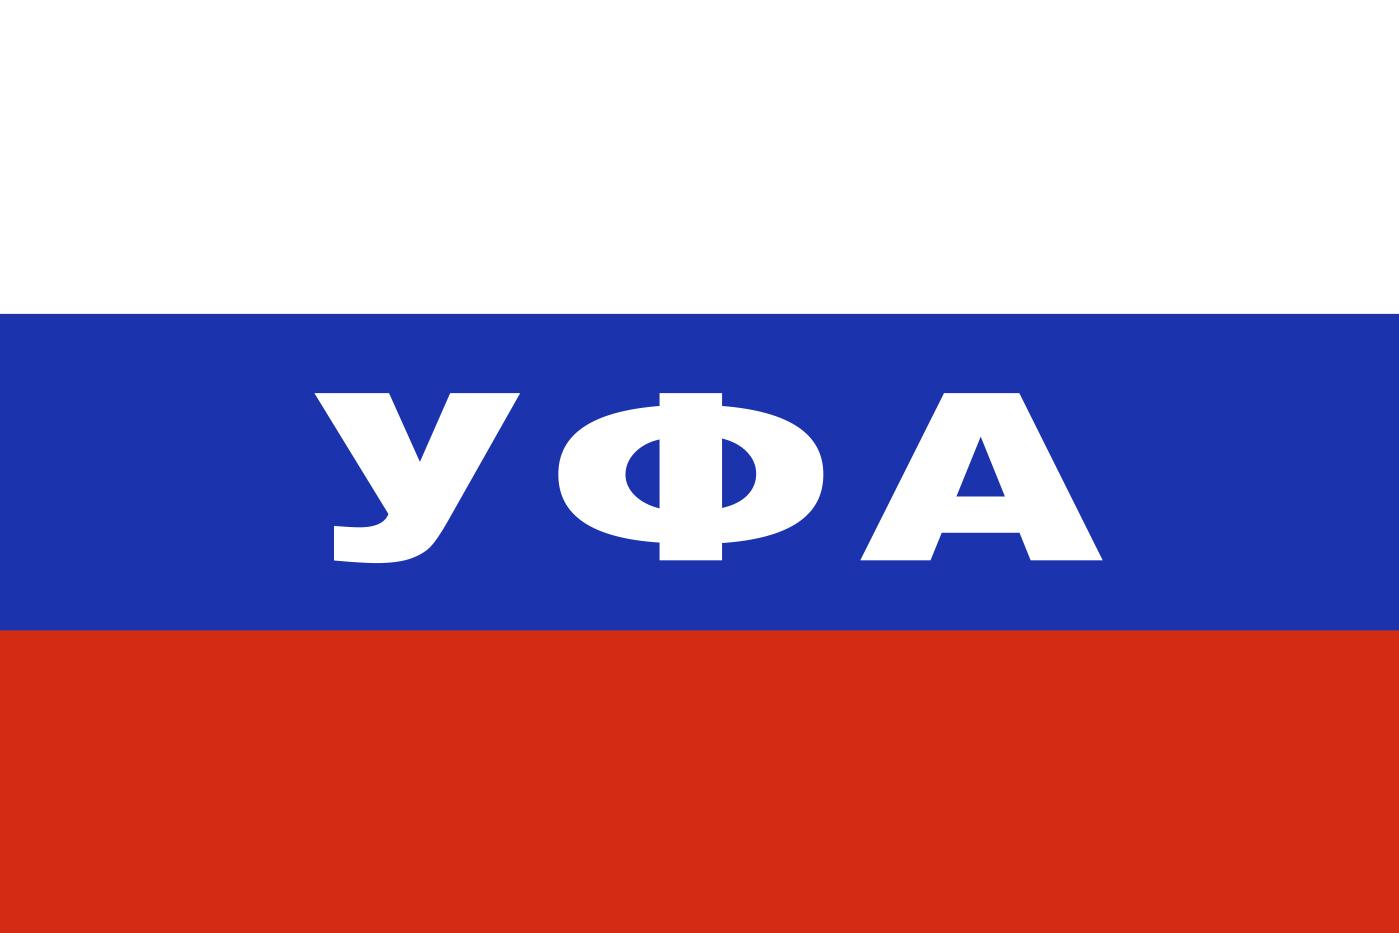 Флаг триколор Уфа